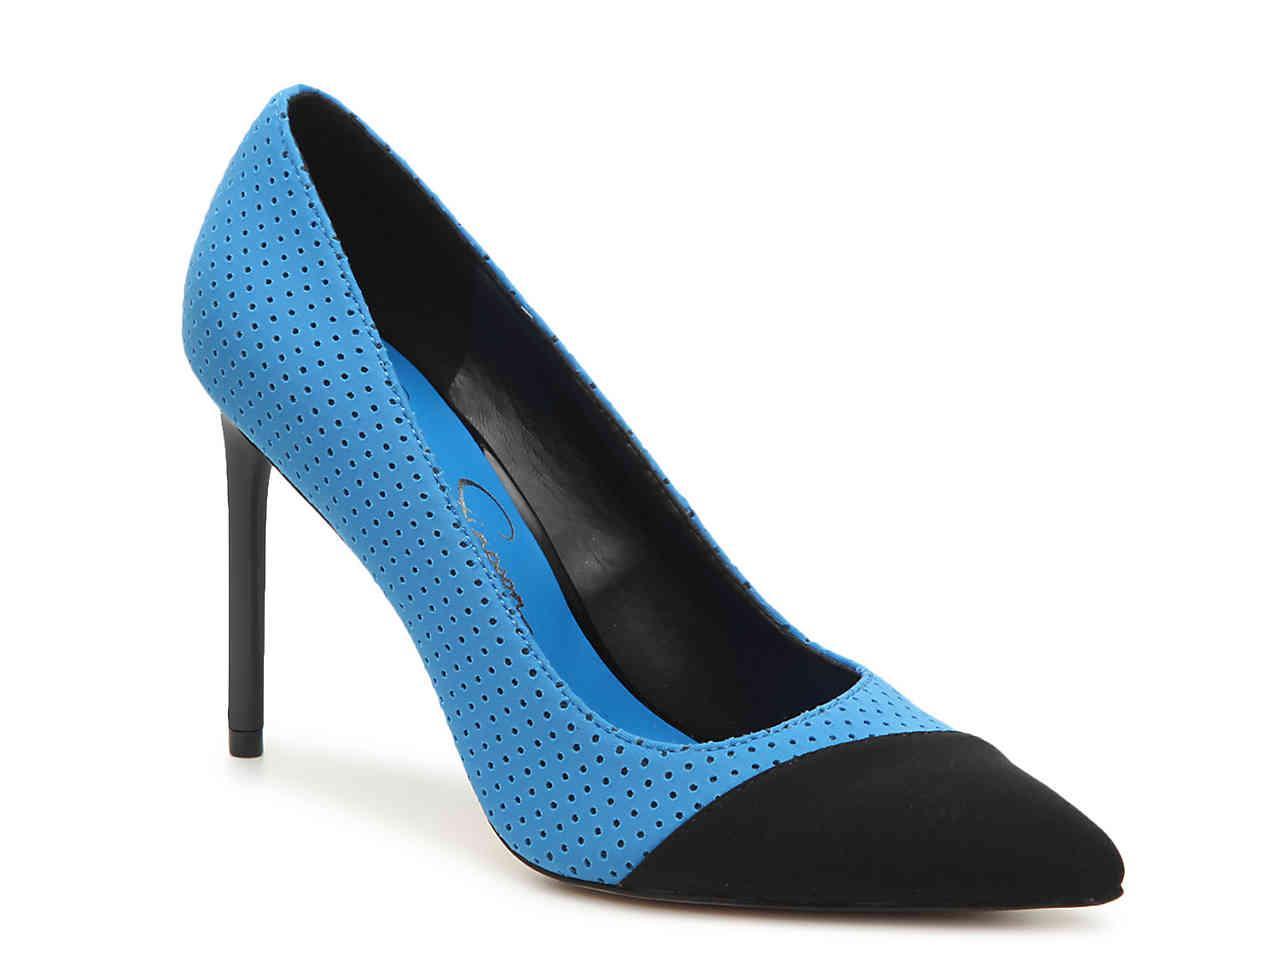 c61c9df5e7 Lyst - Jessica Simpson Kasendra Pump in Blue